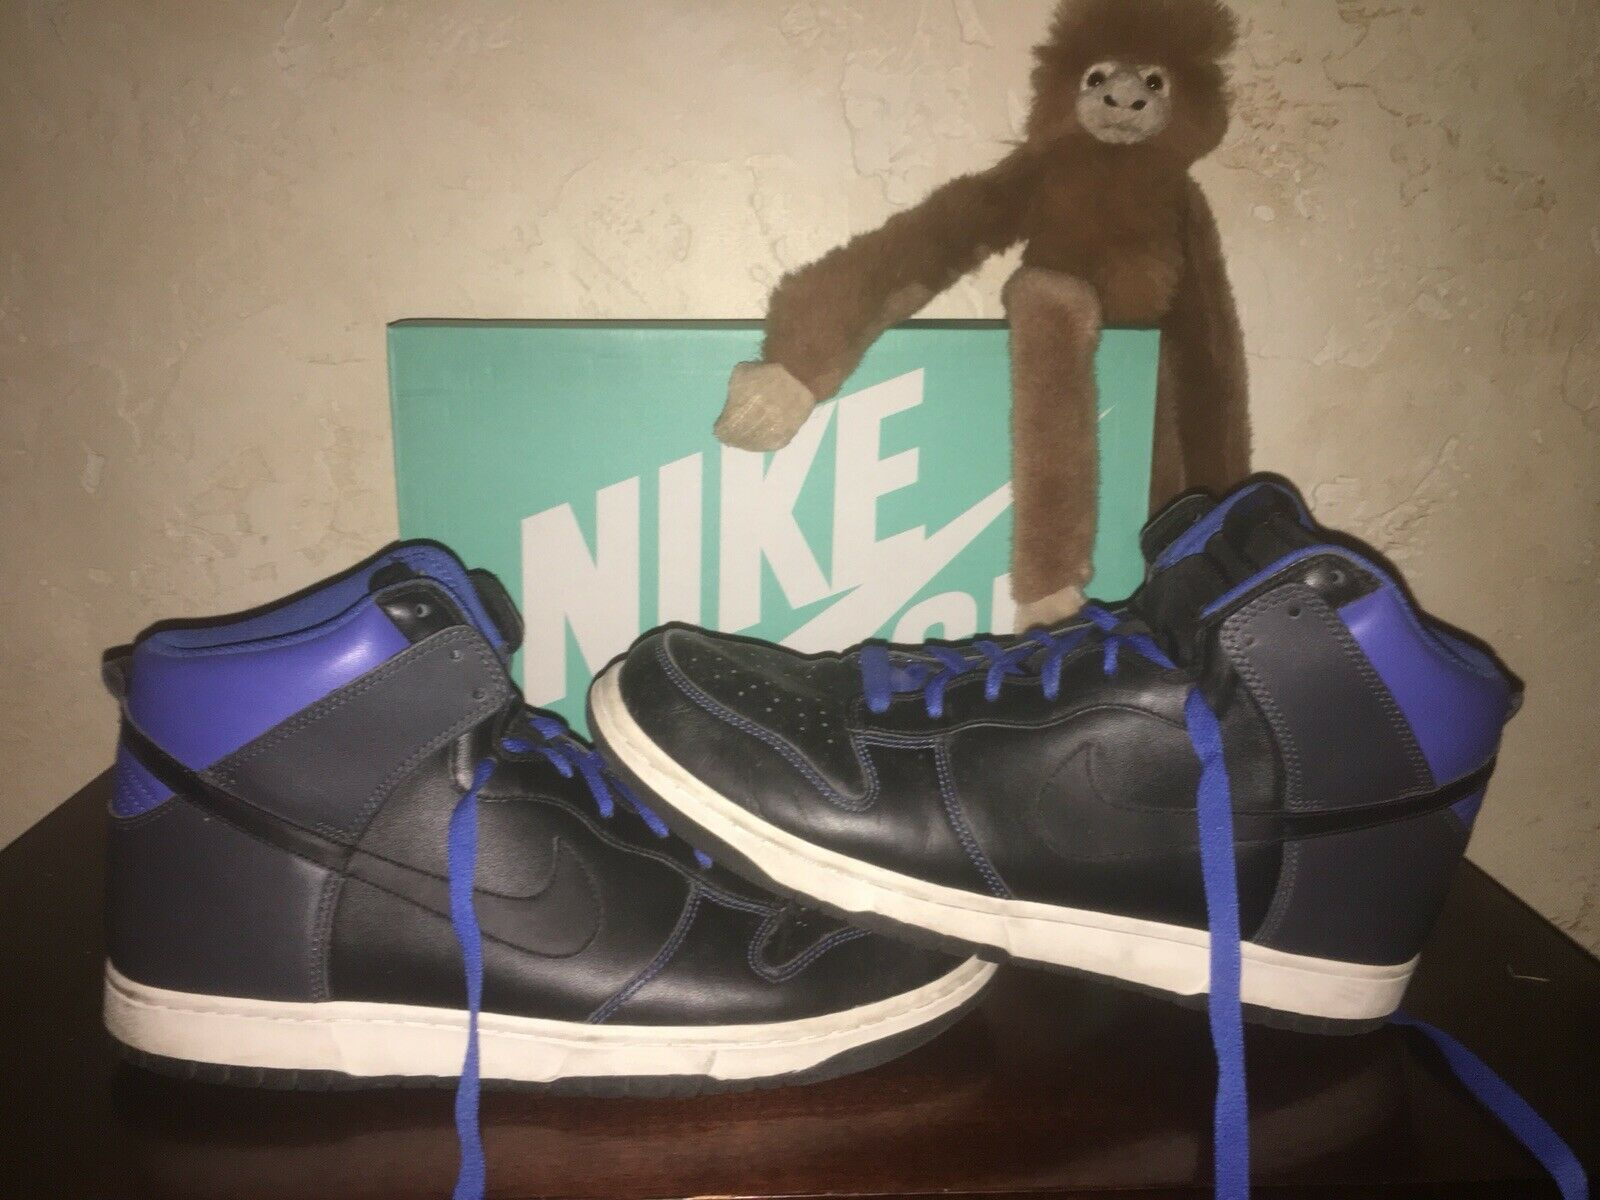 Mens Sz 13 Nike Dunk VARSITY ROYAL ANTHRACITE Black bluee shoes 317982 003